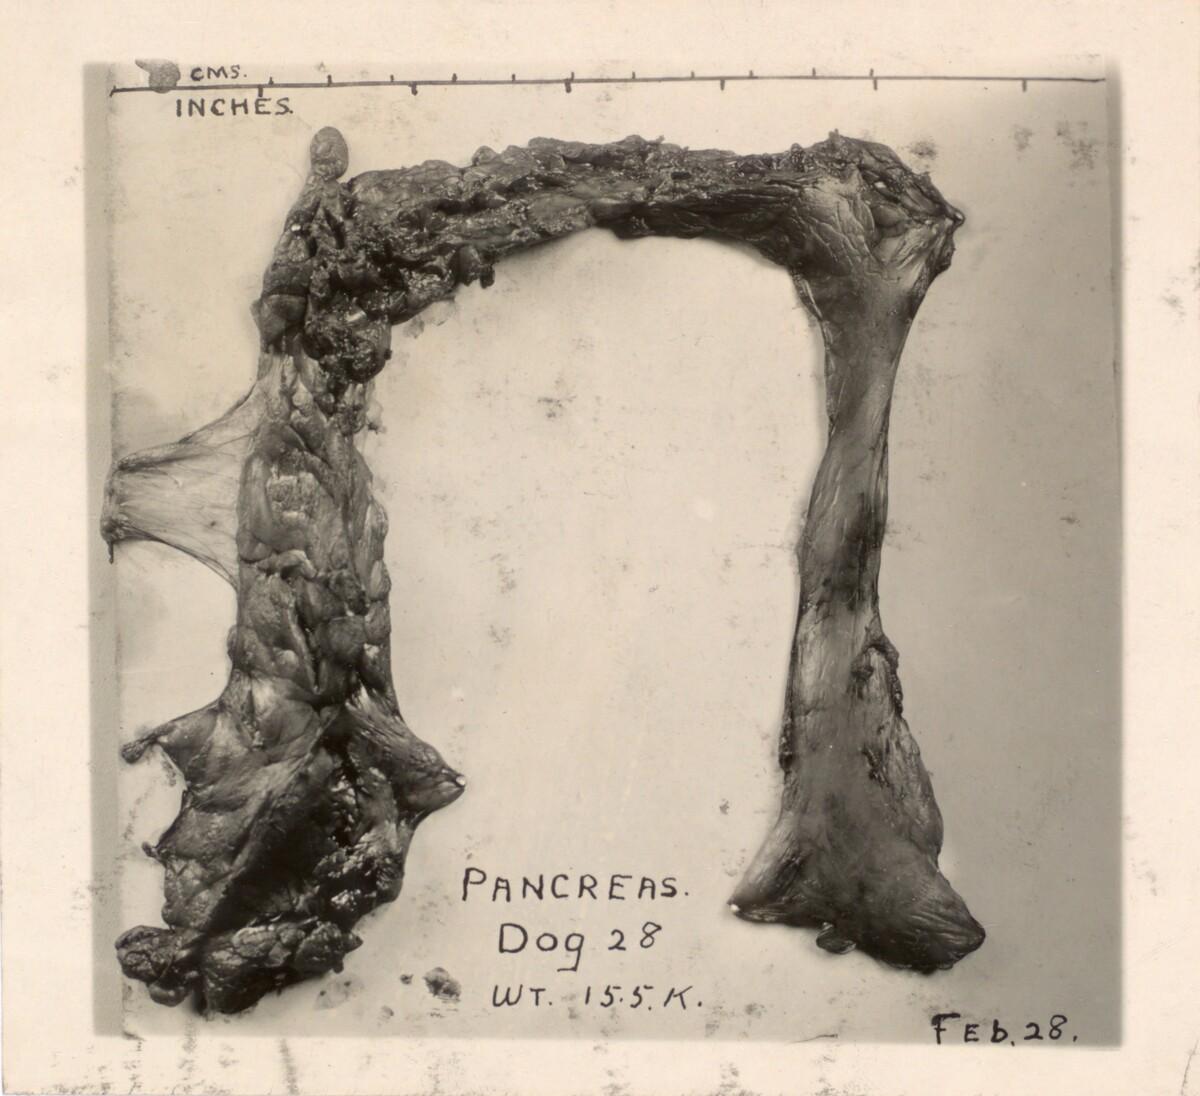 Photograph of pancreas of dog 28.